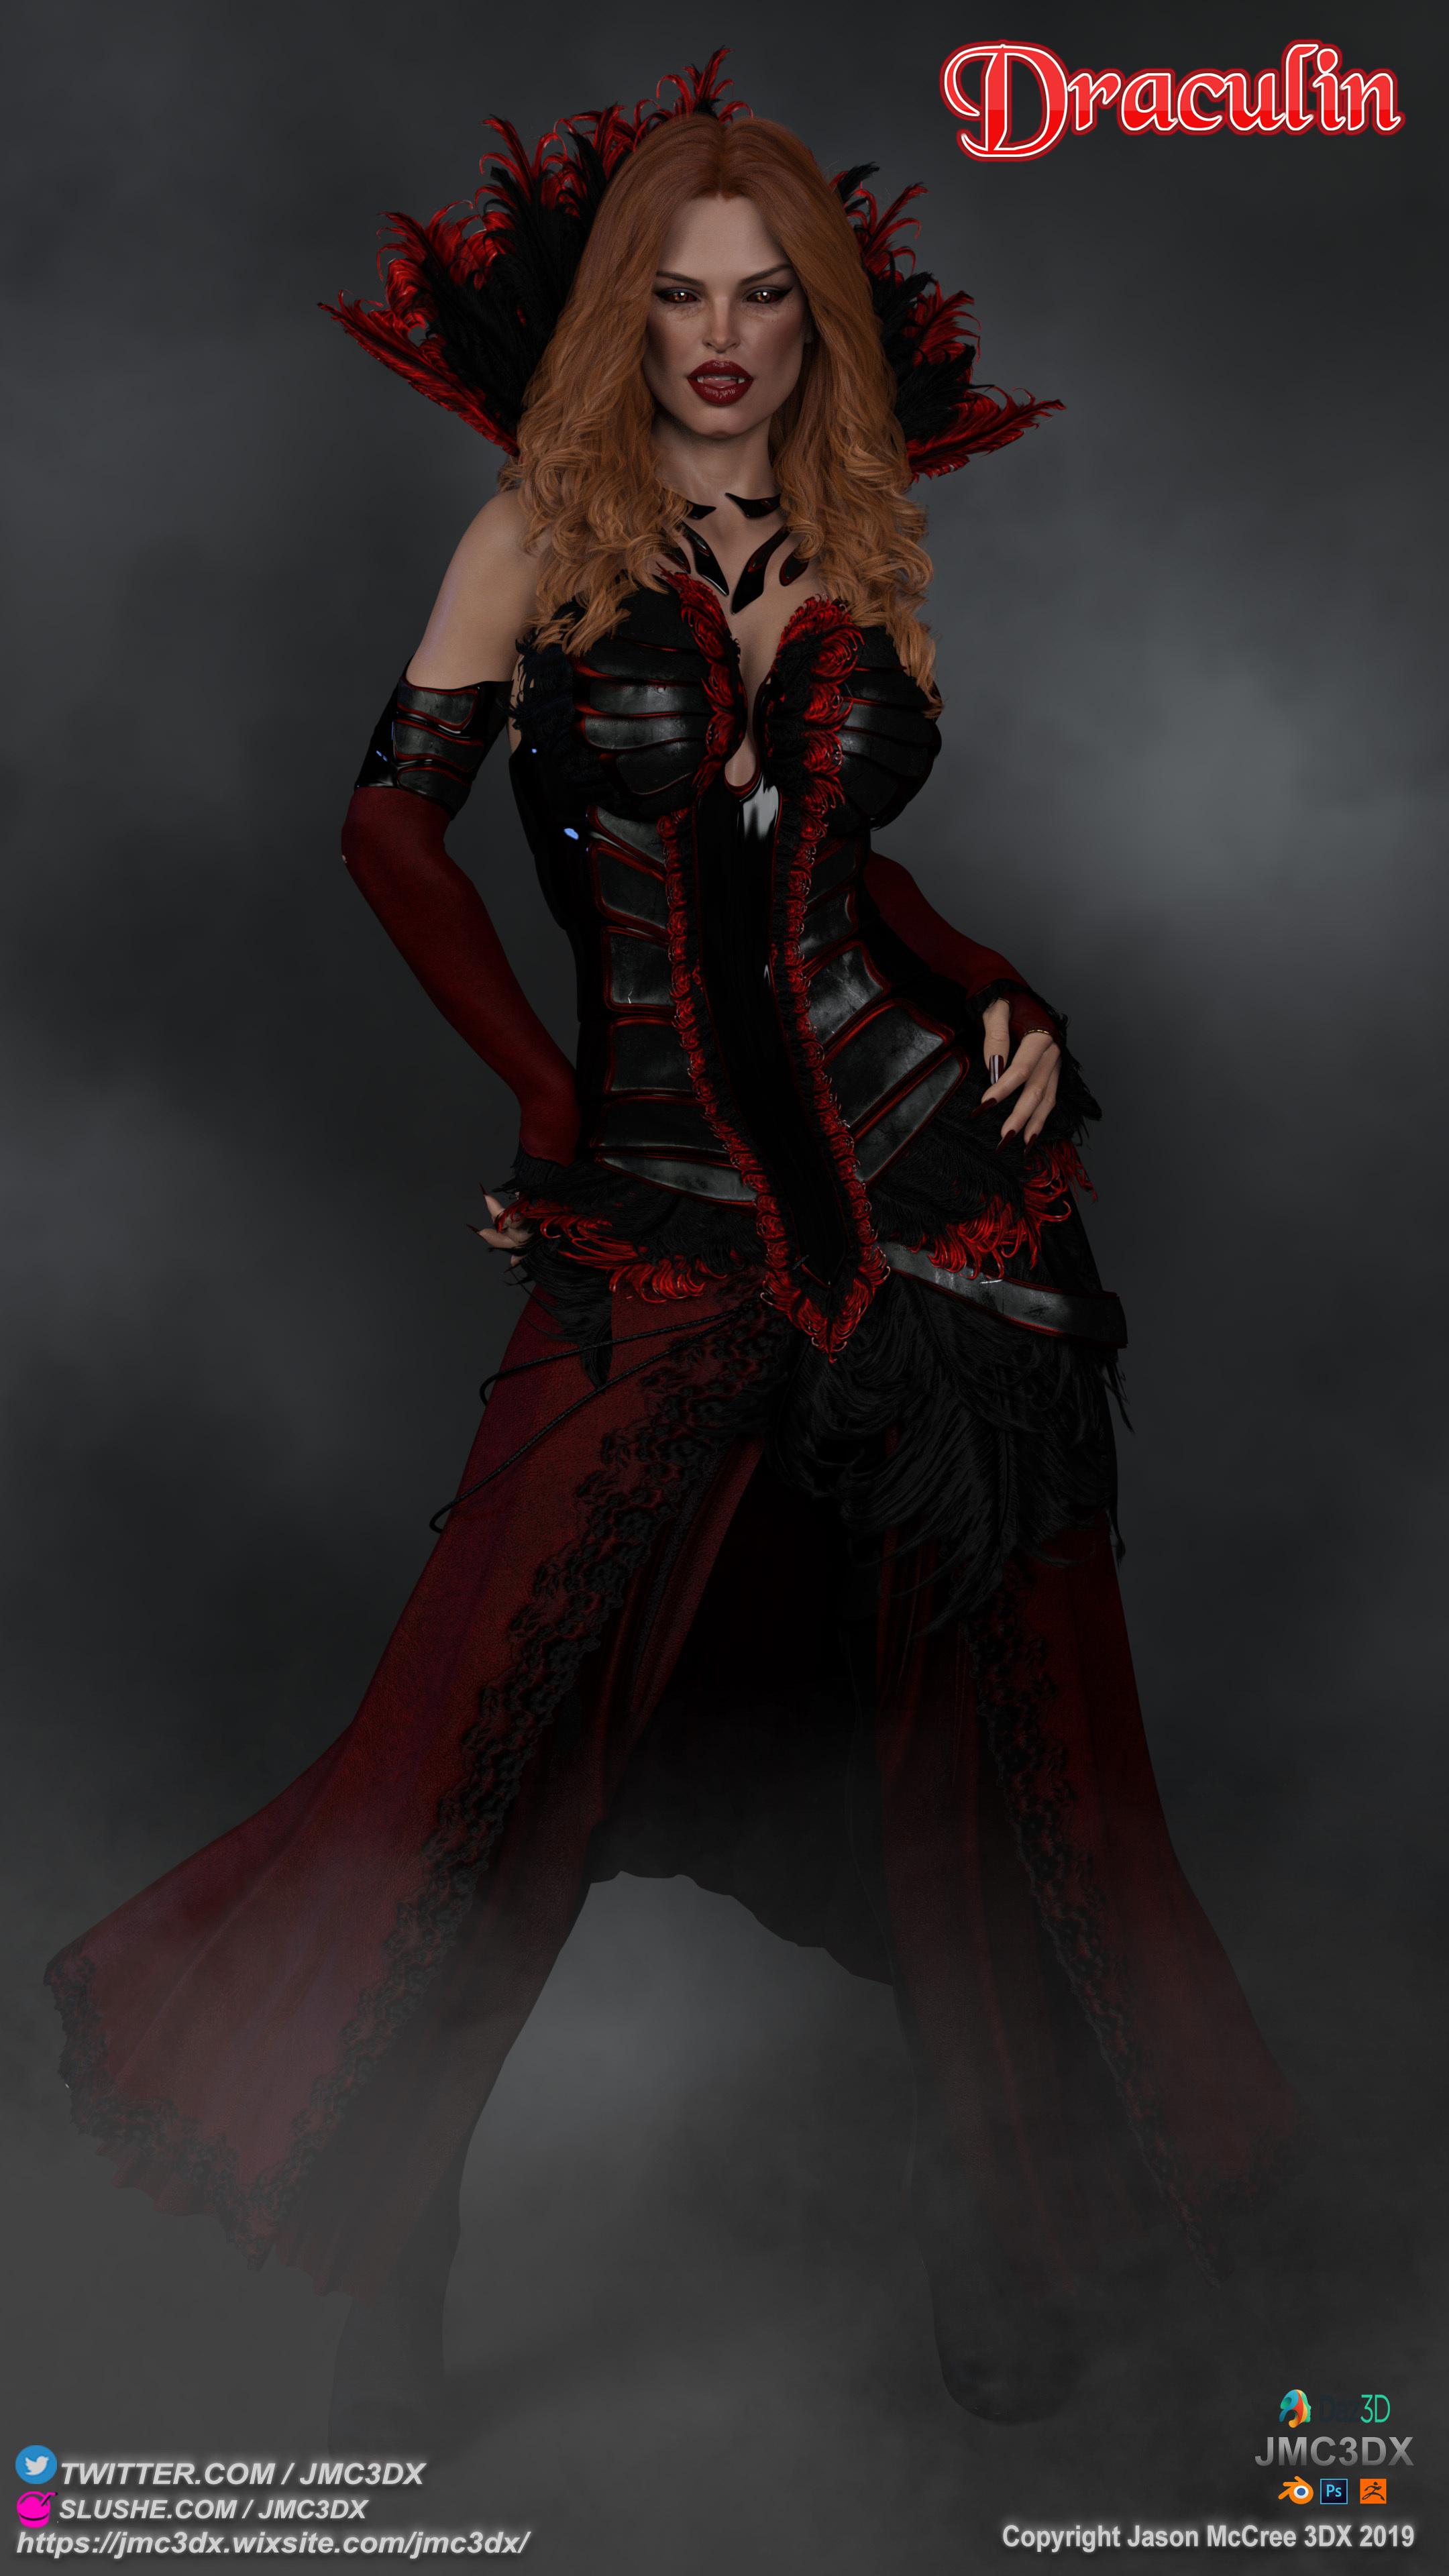 Draculin: The First Futa Vampire OC by JMC3DX